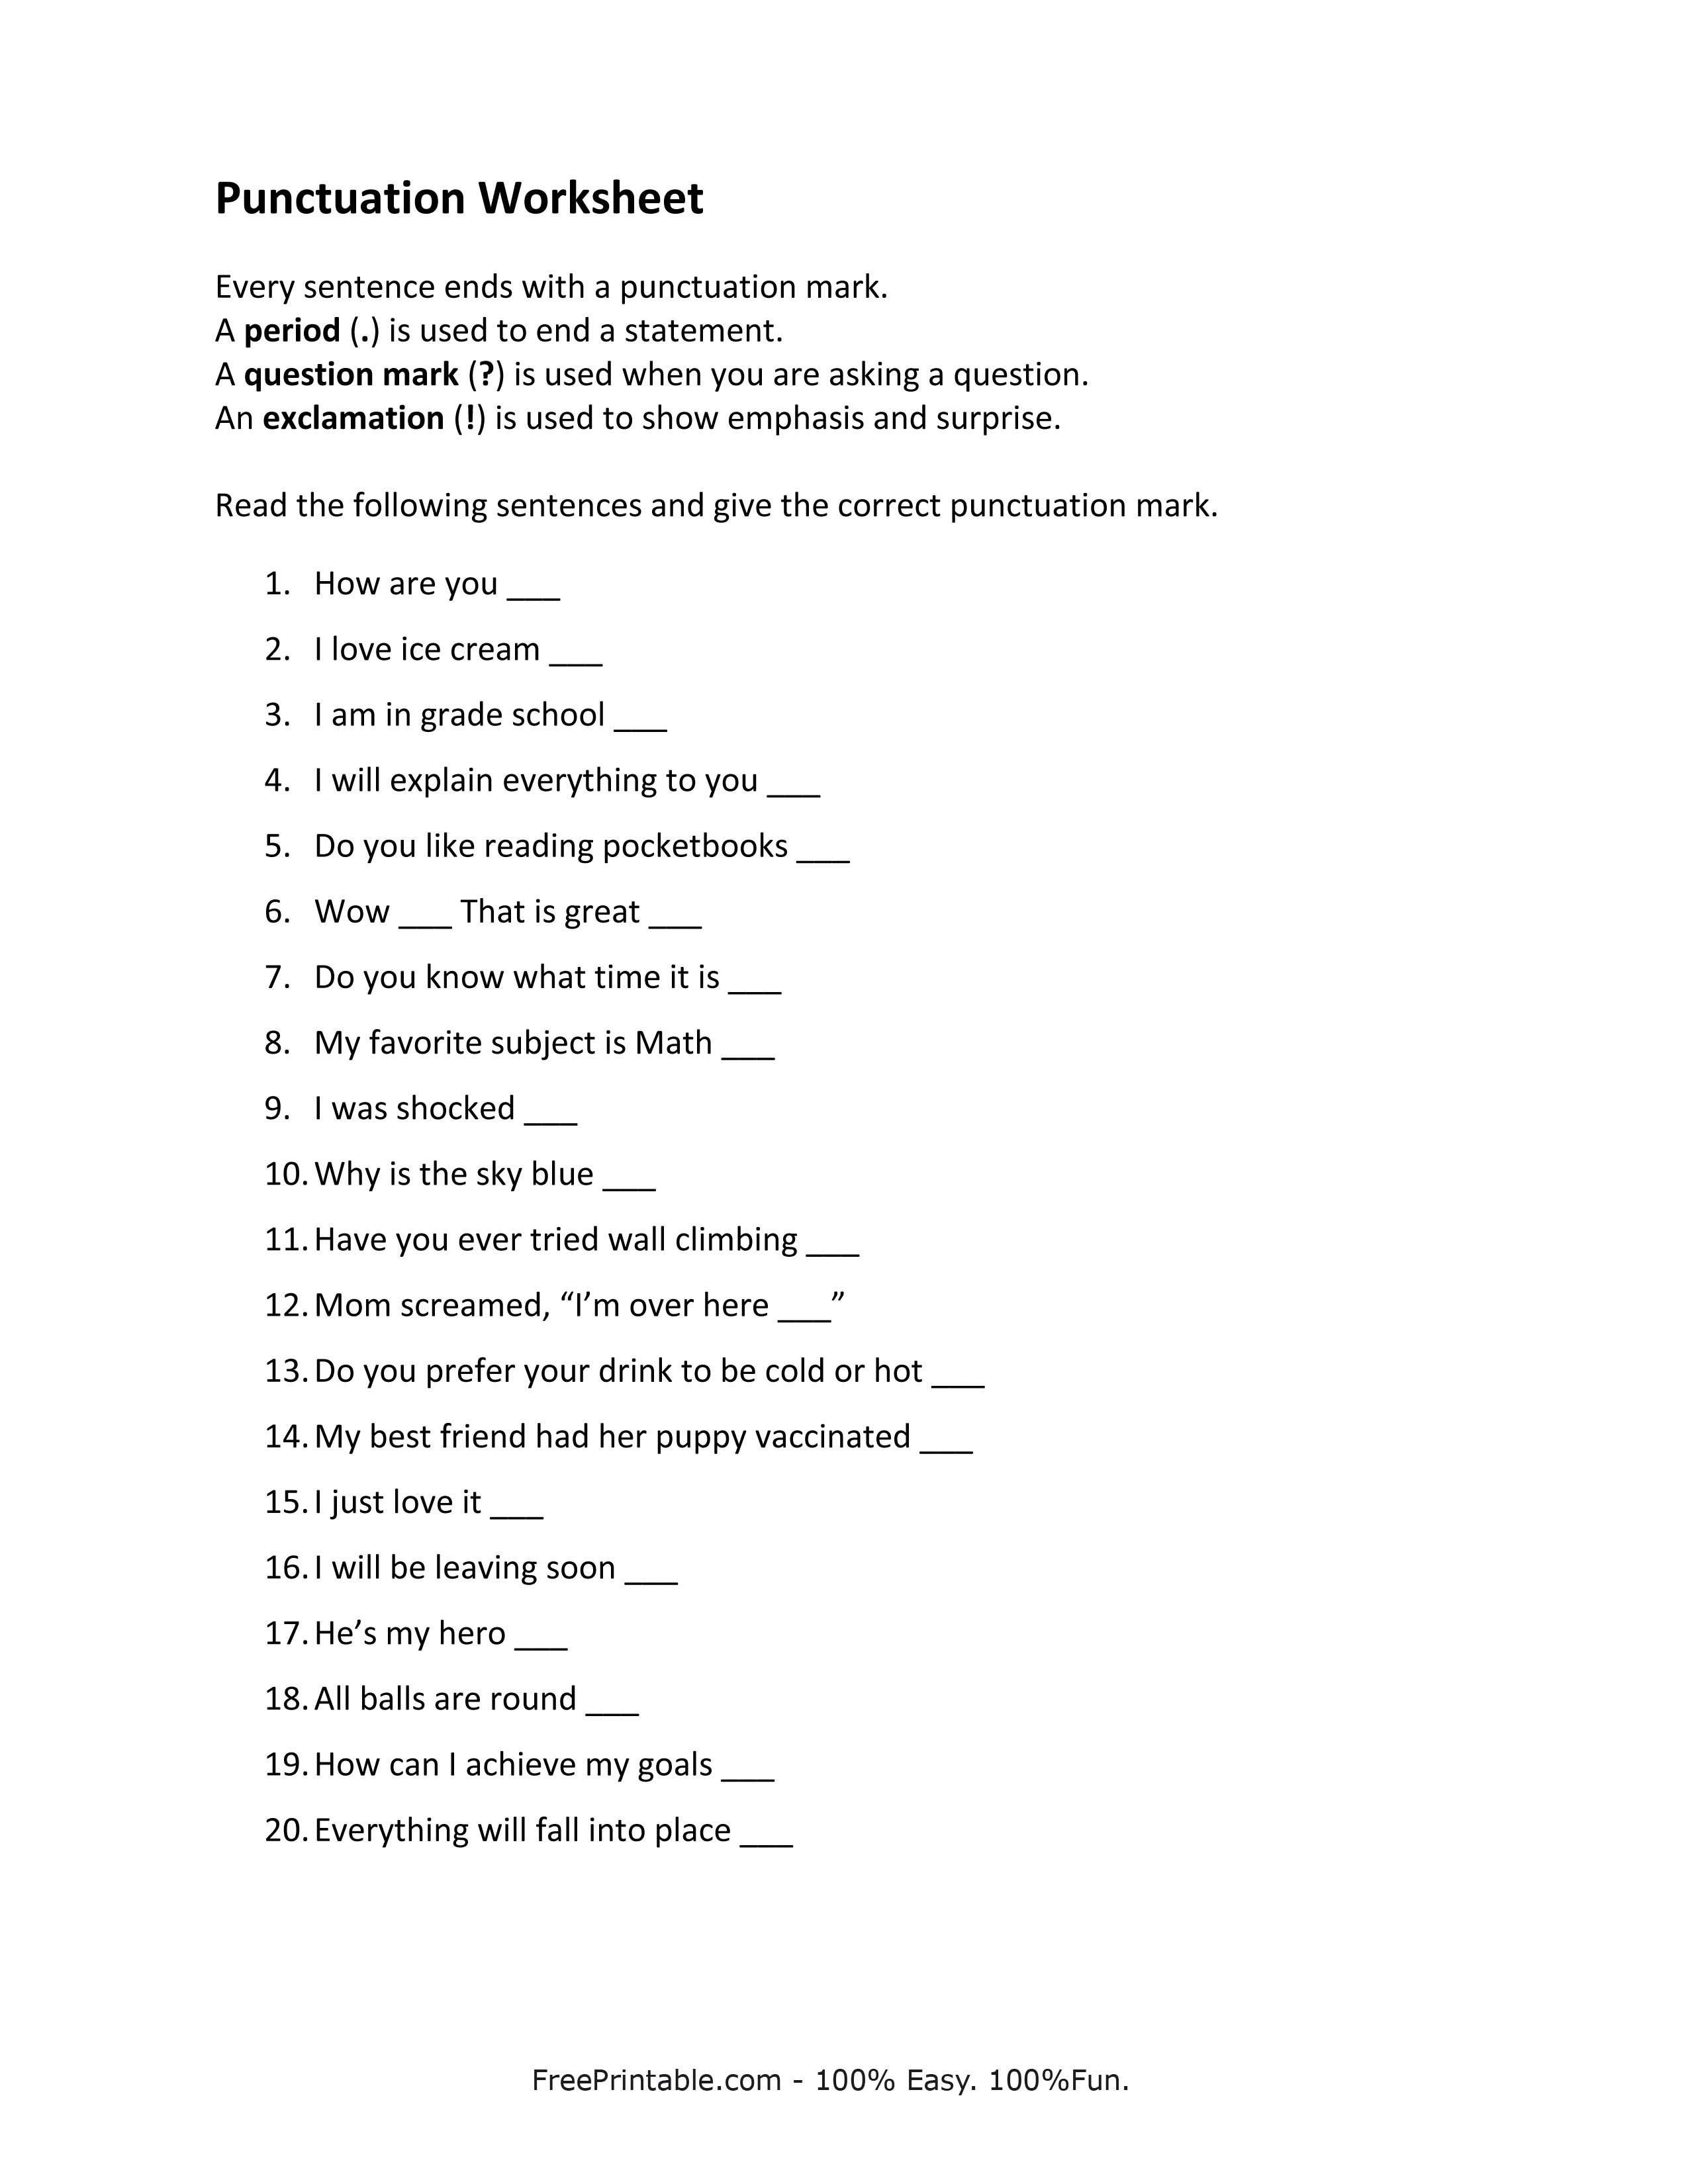 Worksheets Free Printable Punctuation Worksheets customize your free printable punctuation worksheet class worksheet